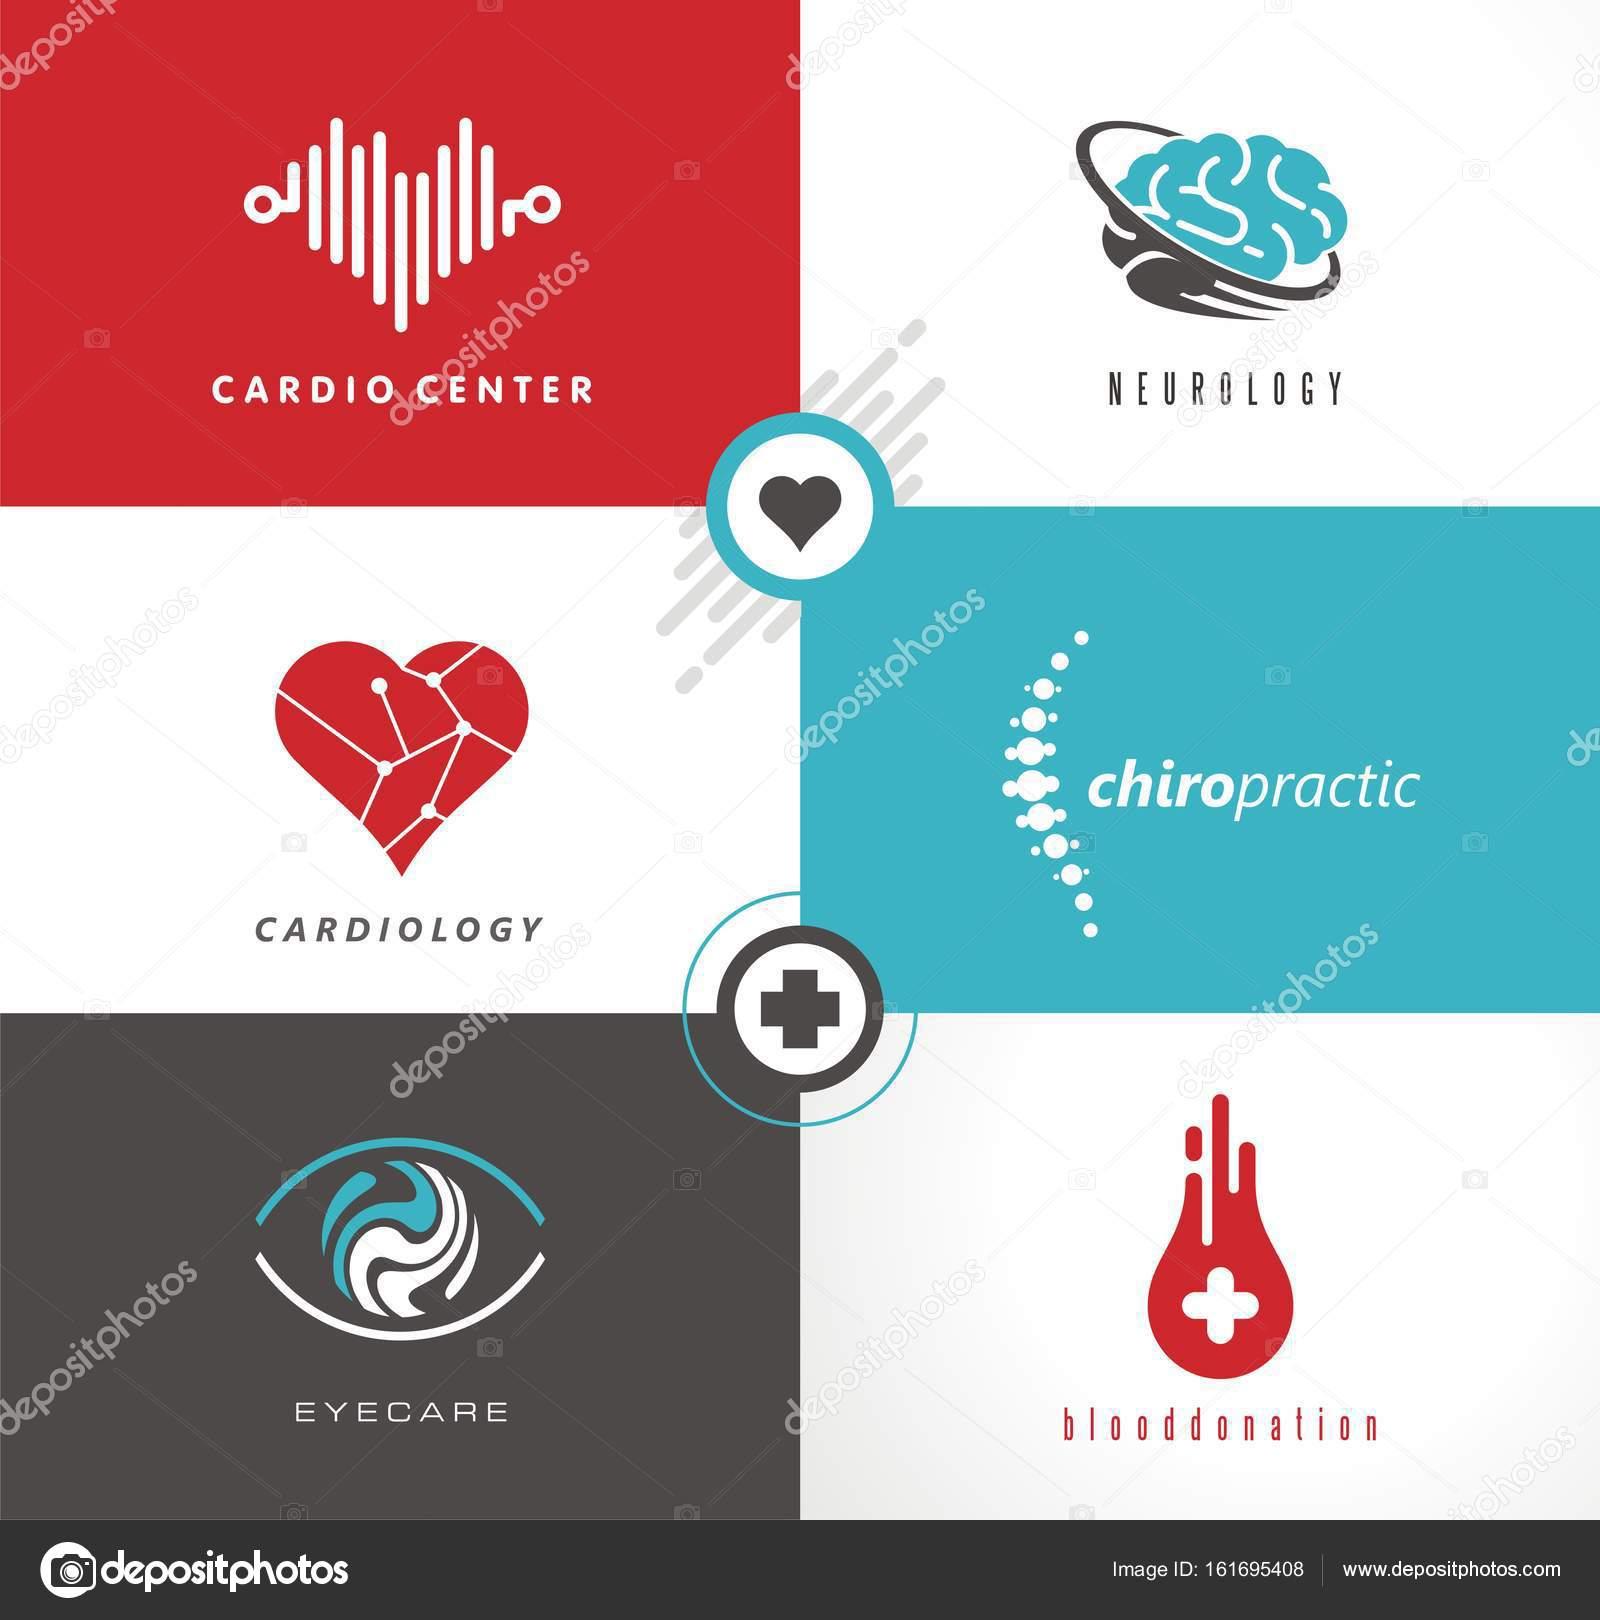 Medical logo ideas | Medicine logo design ideas. Cardiology ...